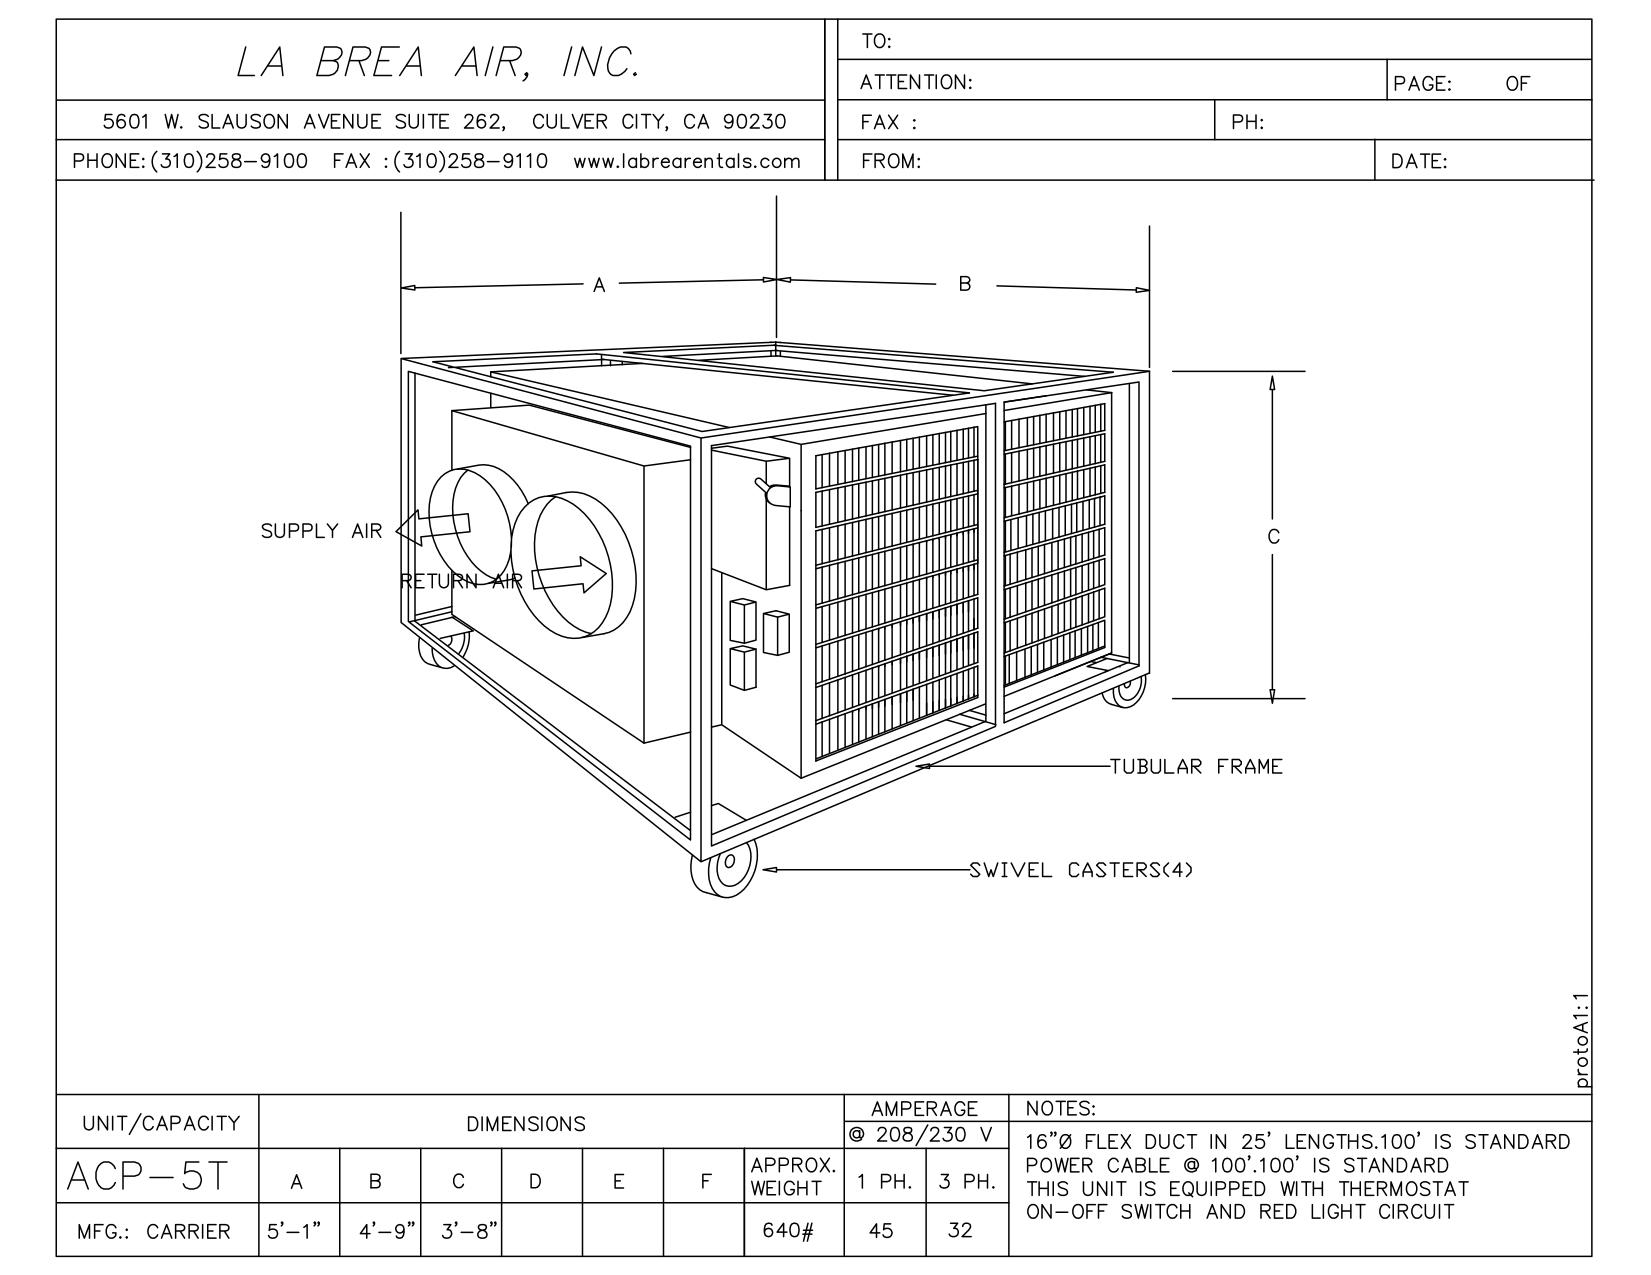 5Tcart(C)3-5_ACP Model (1)